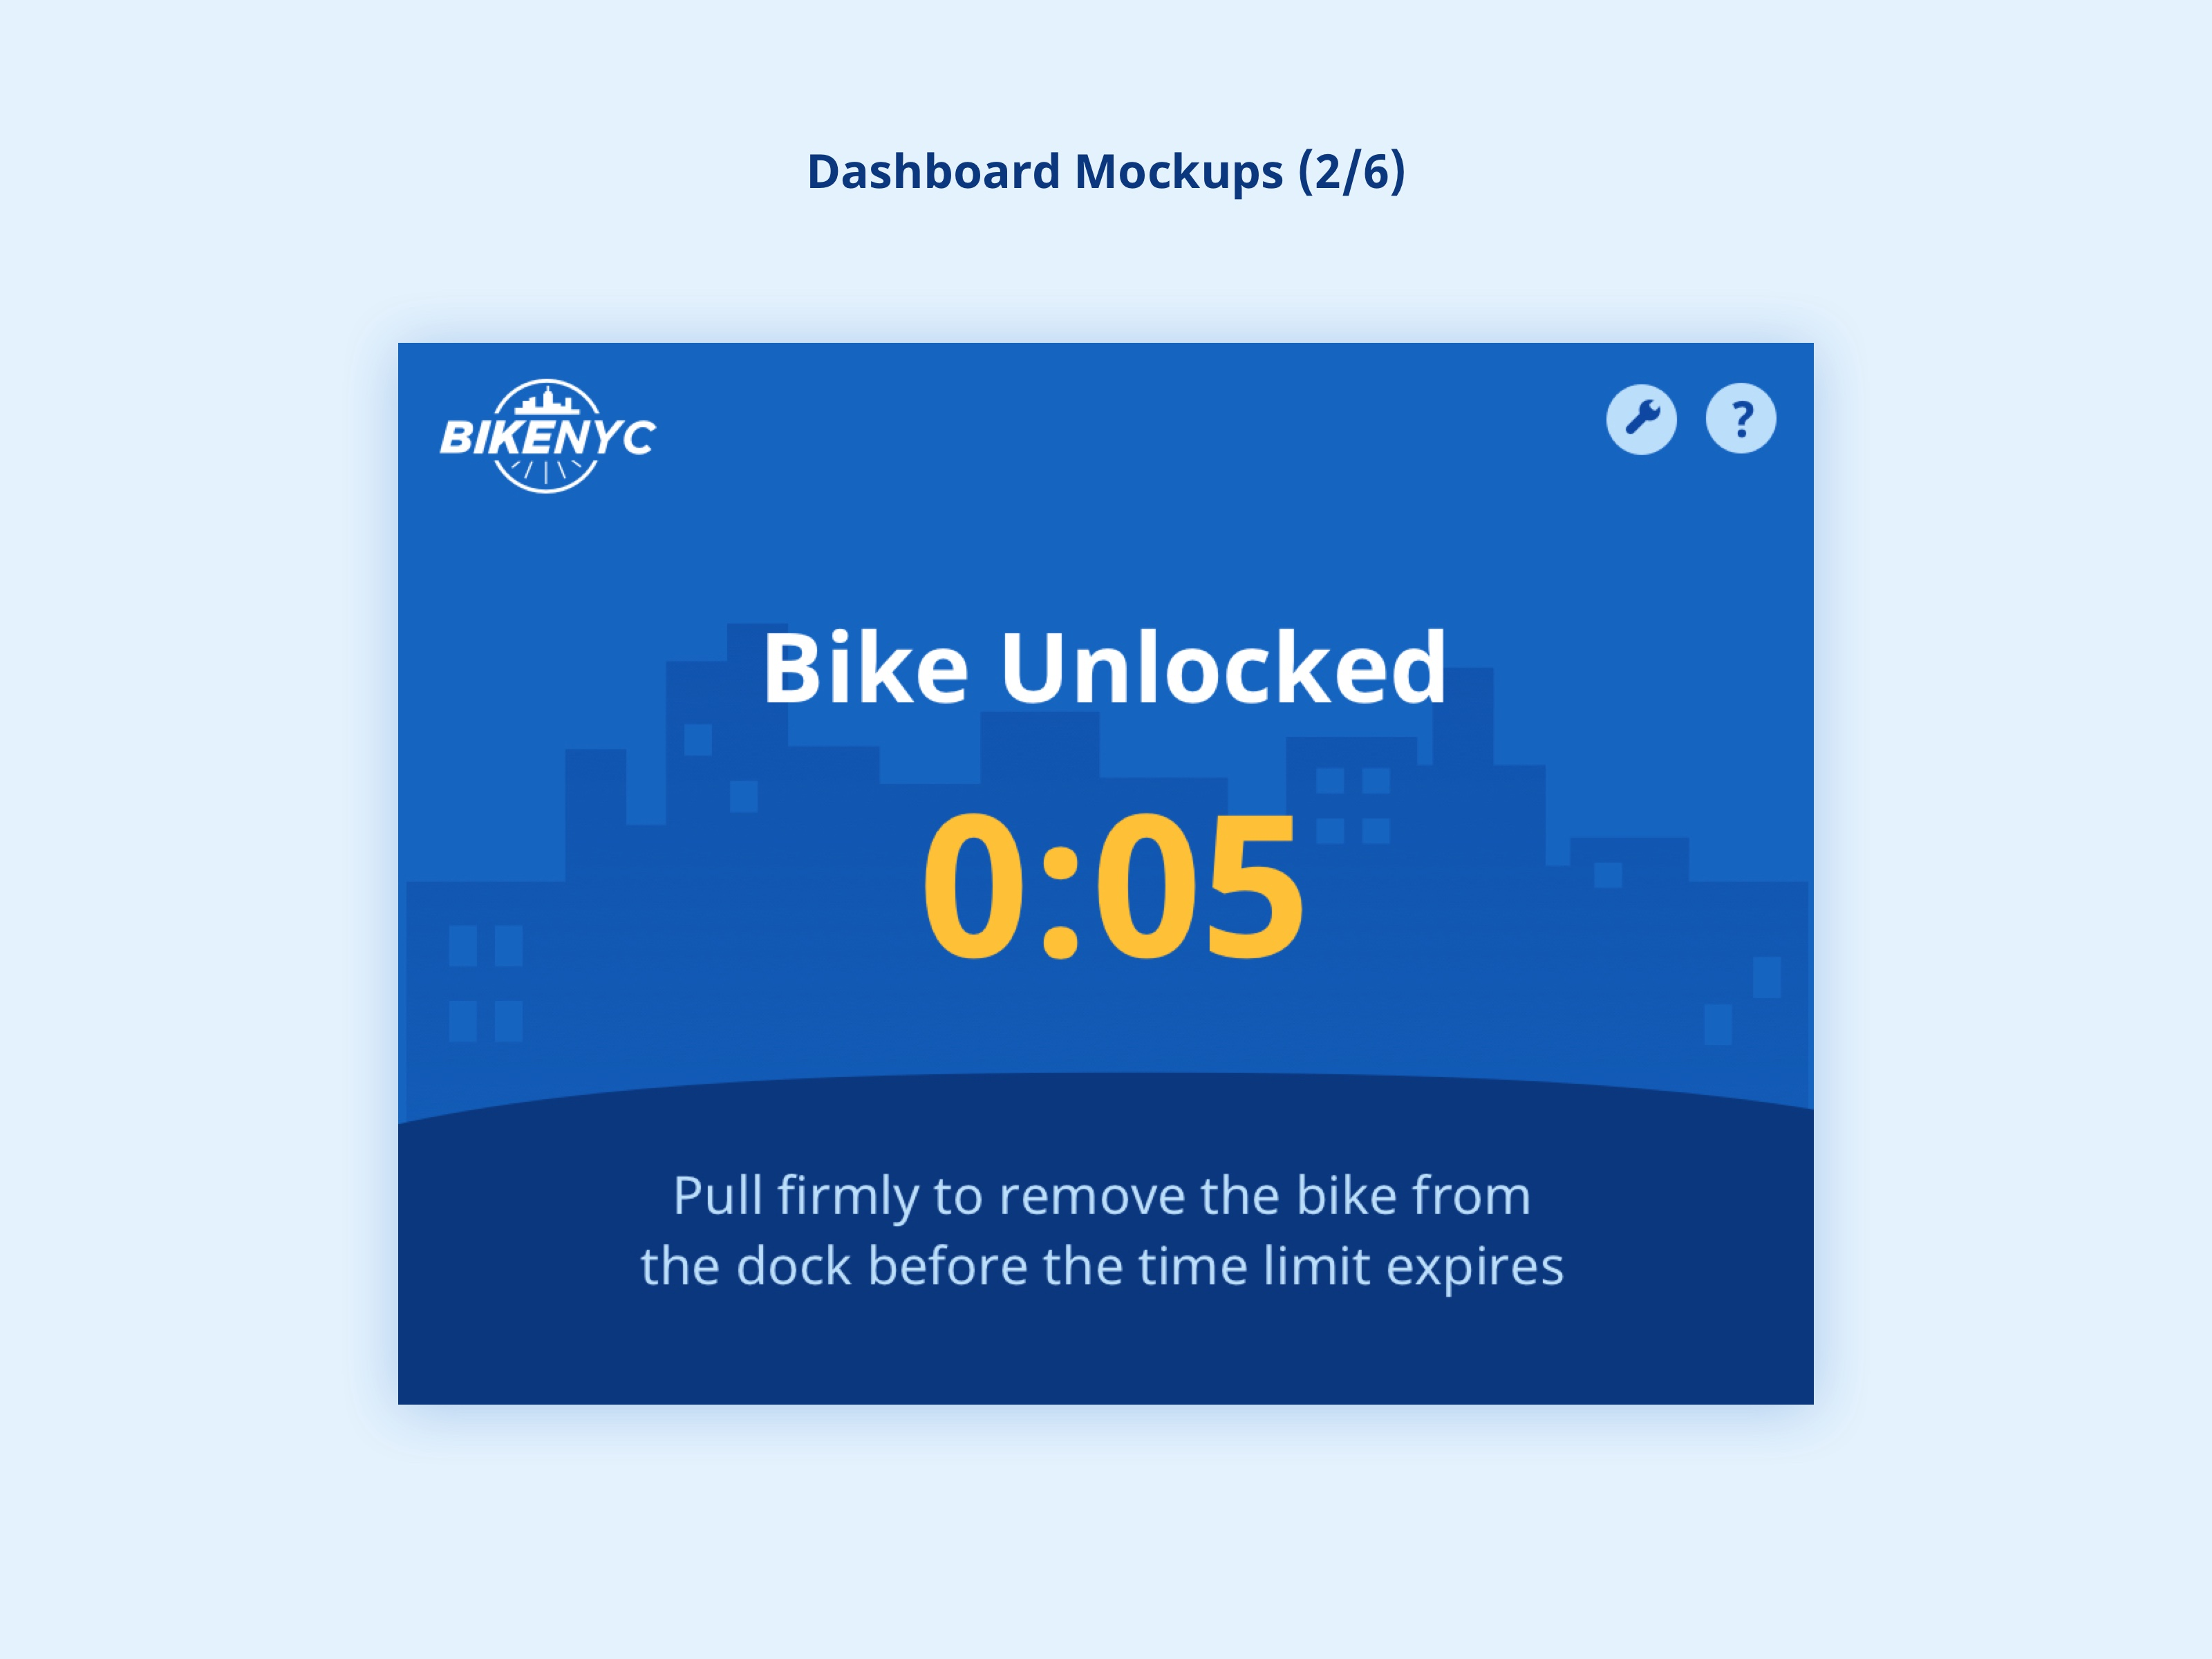 BikeNYC Dashboard - Unlocked